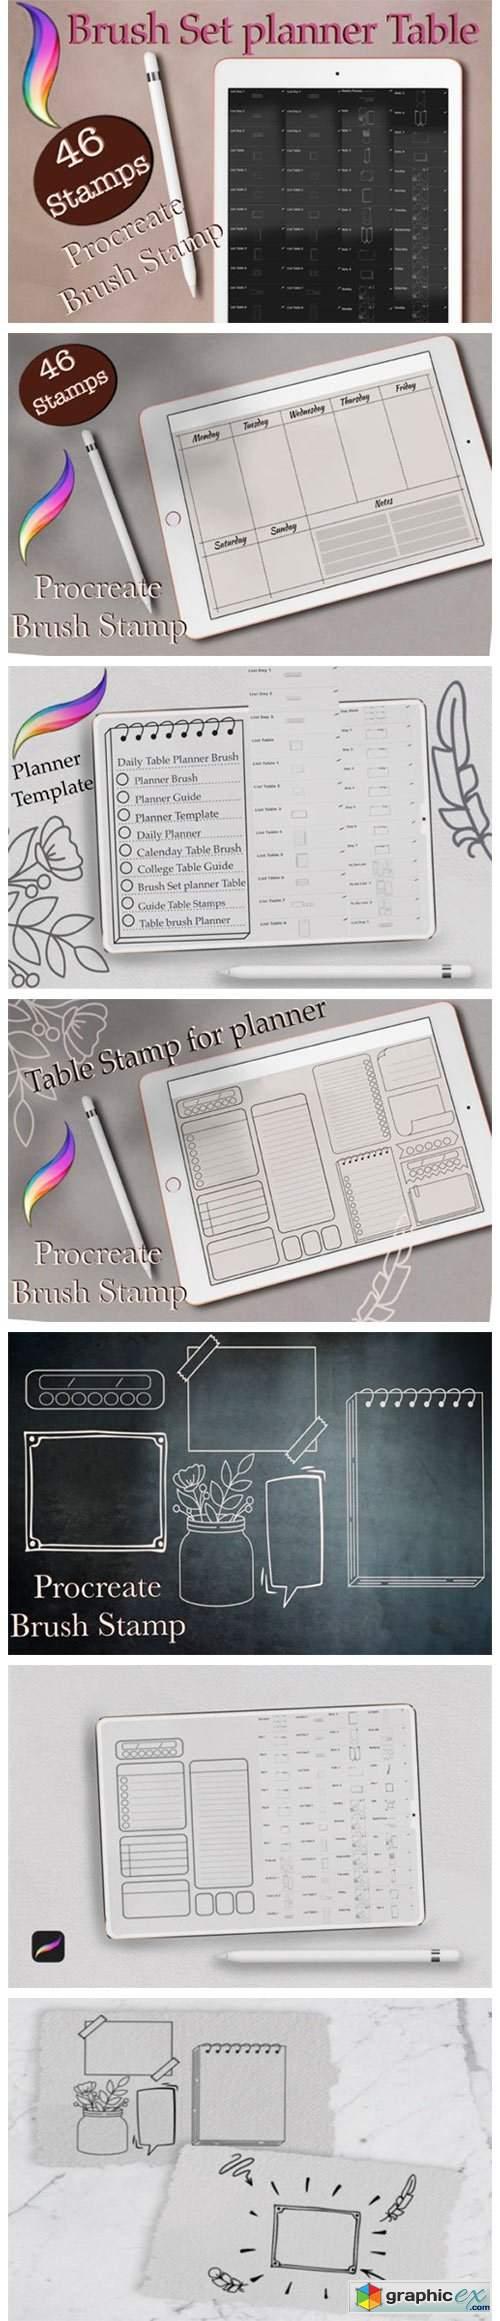 46 Planner Stamps, Brush Stamp Planner